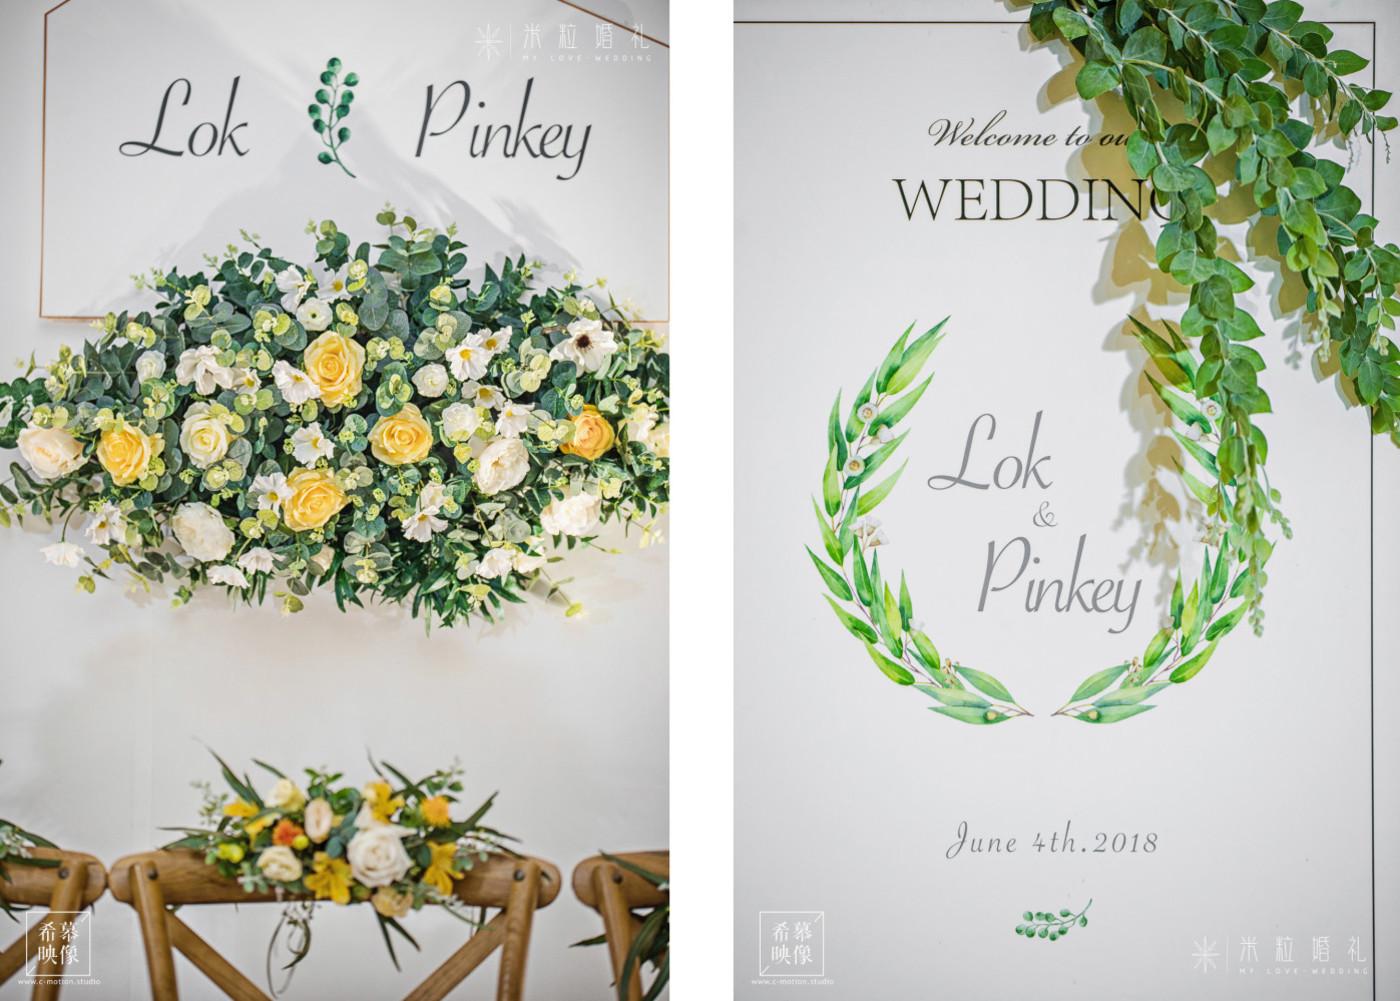 Lok&Pinkey's Wedding40